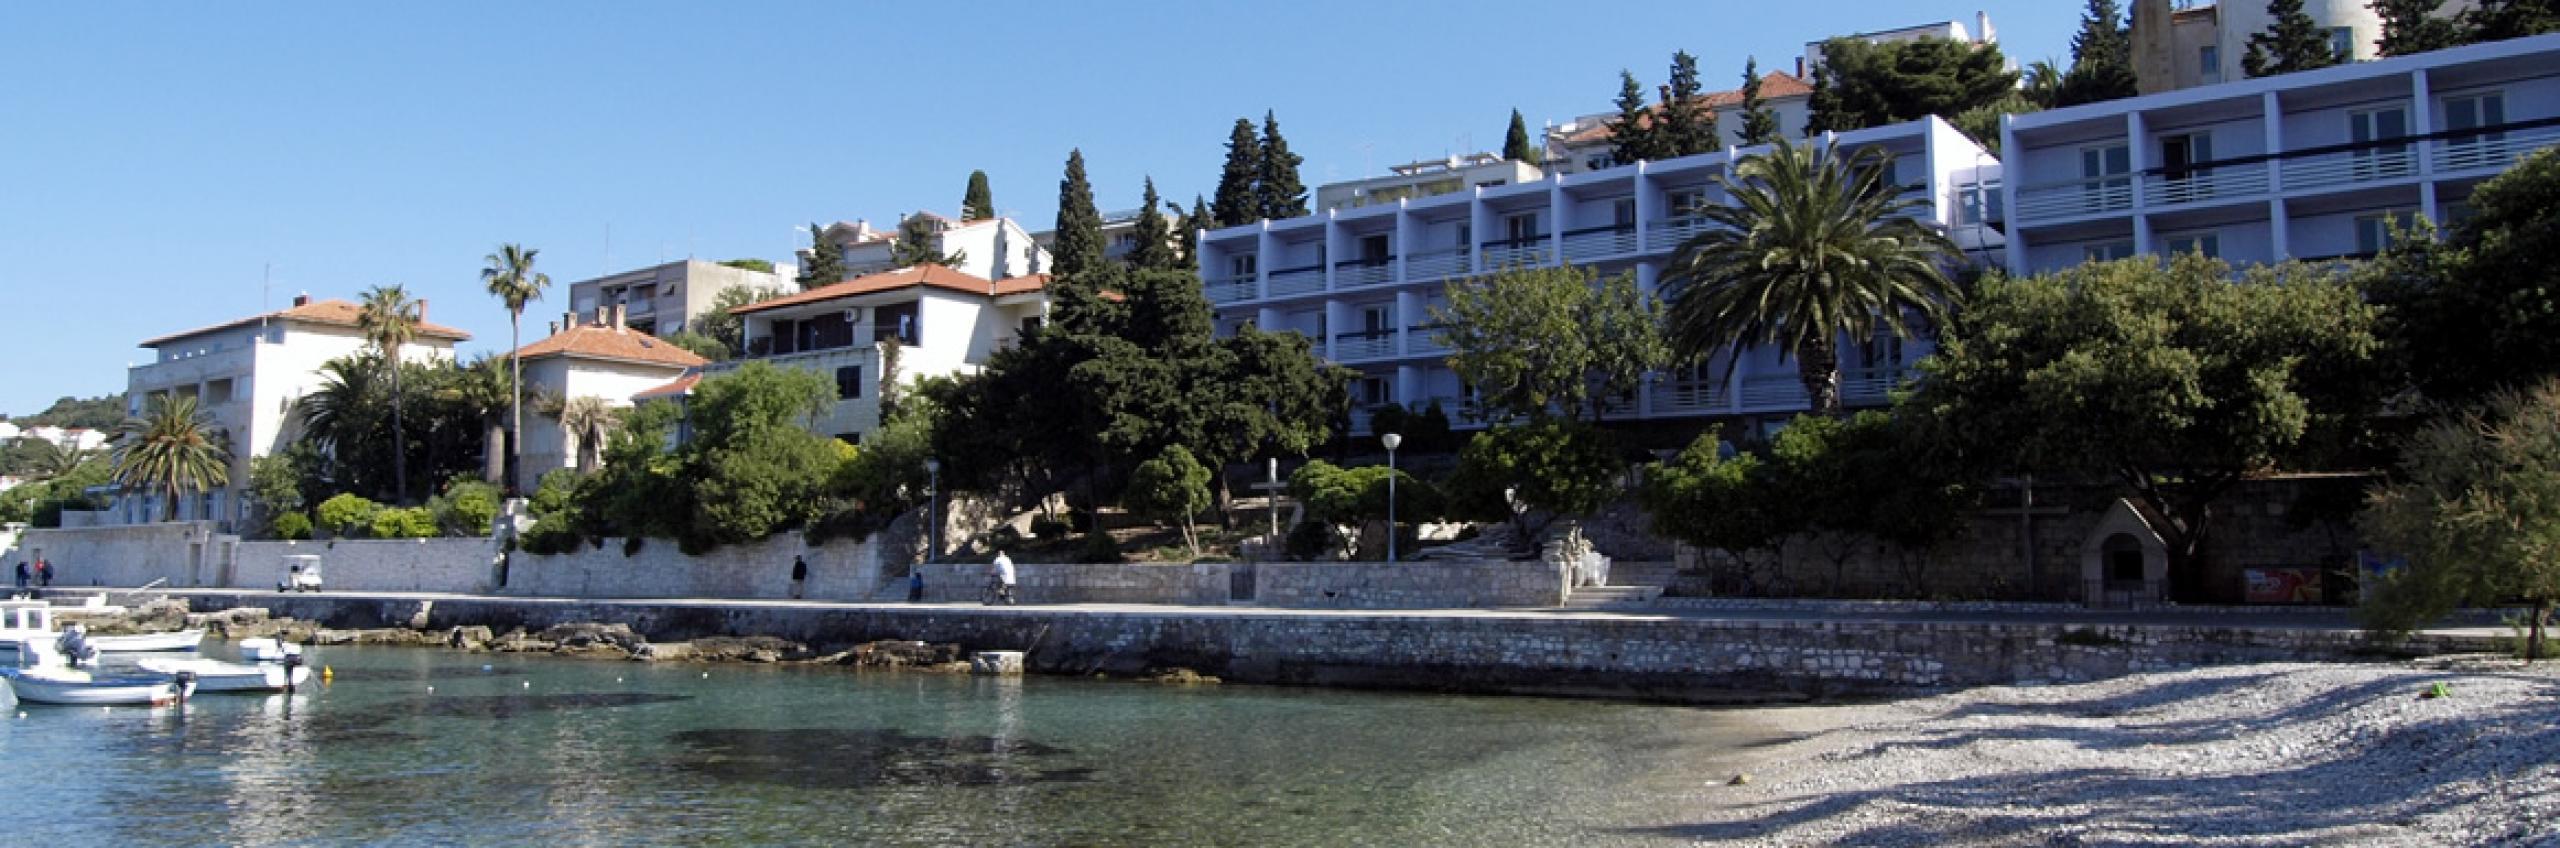 Hotel Villa Dalmacija Hvar